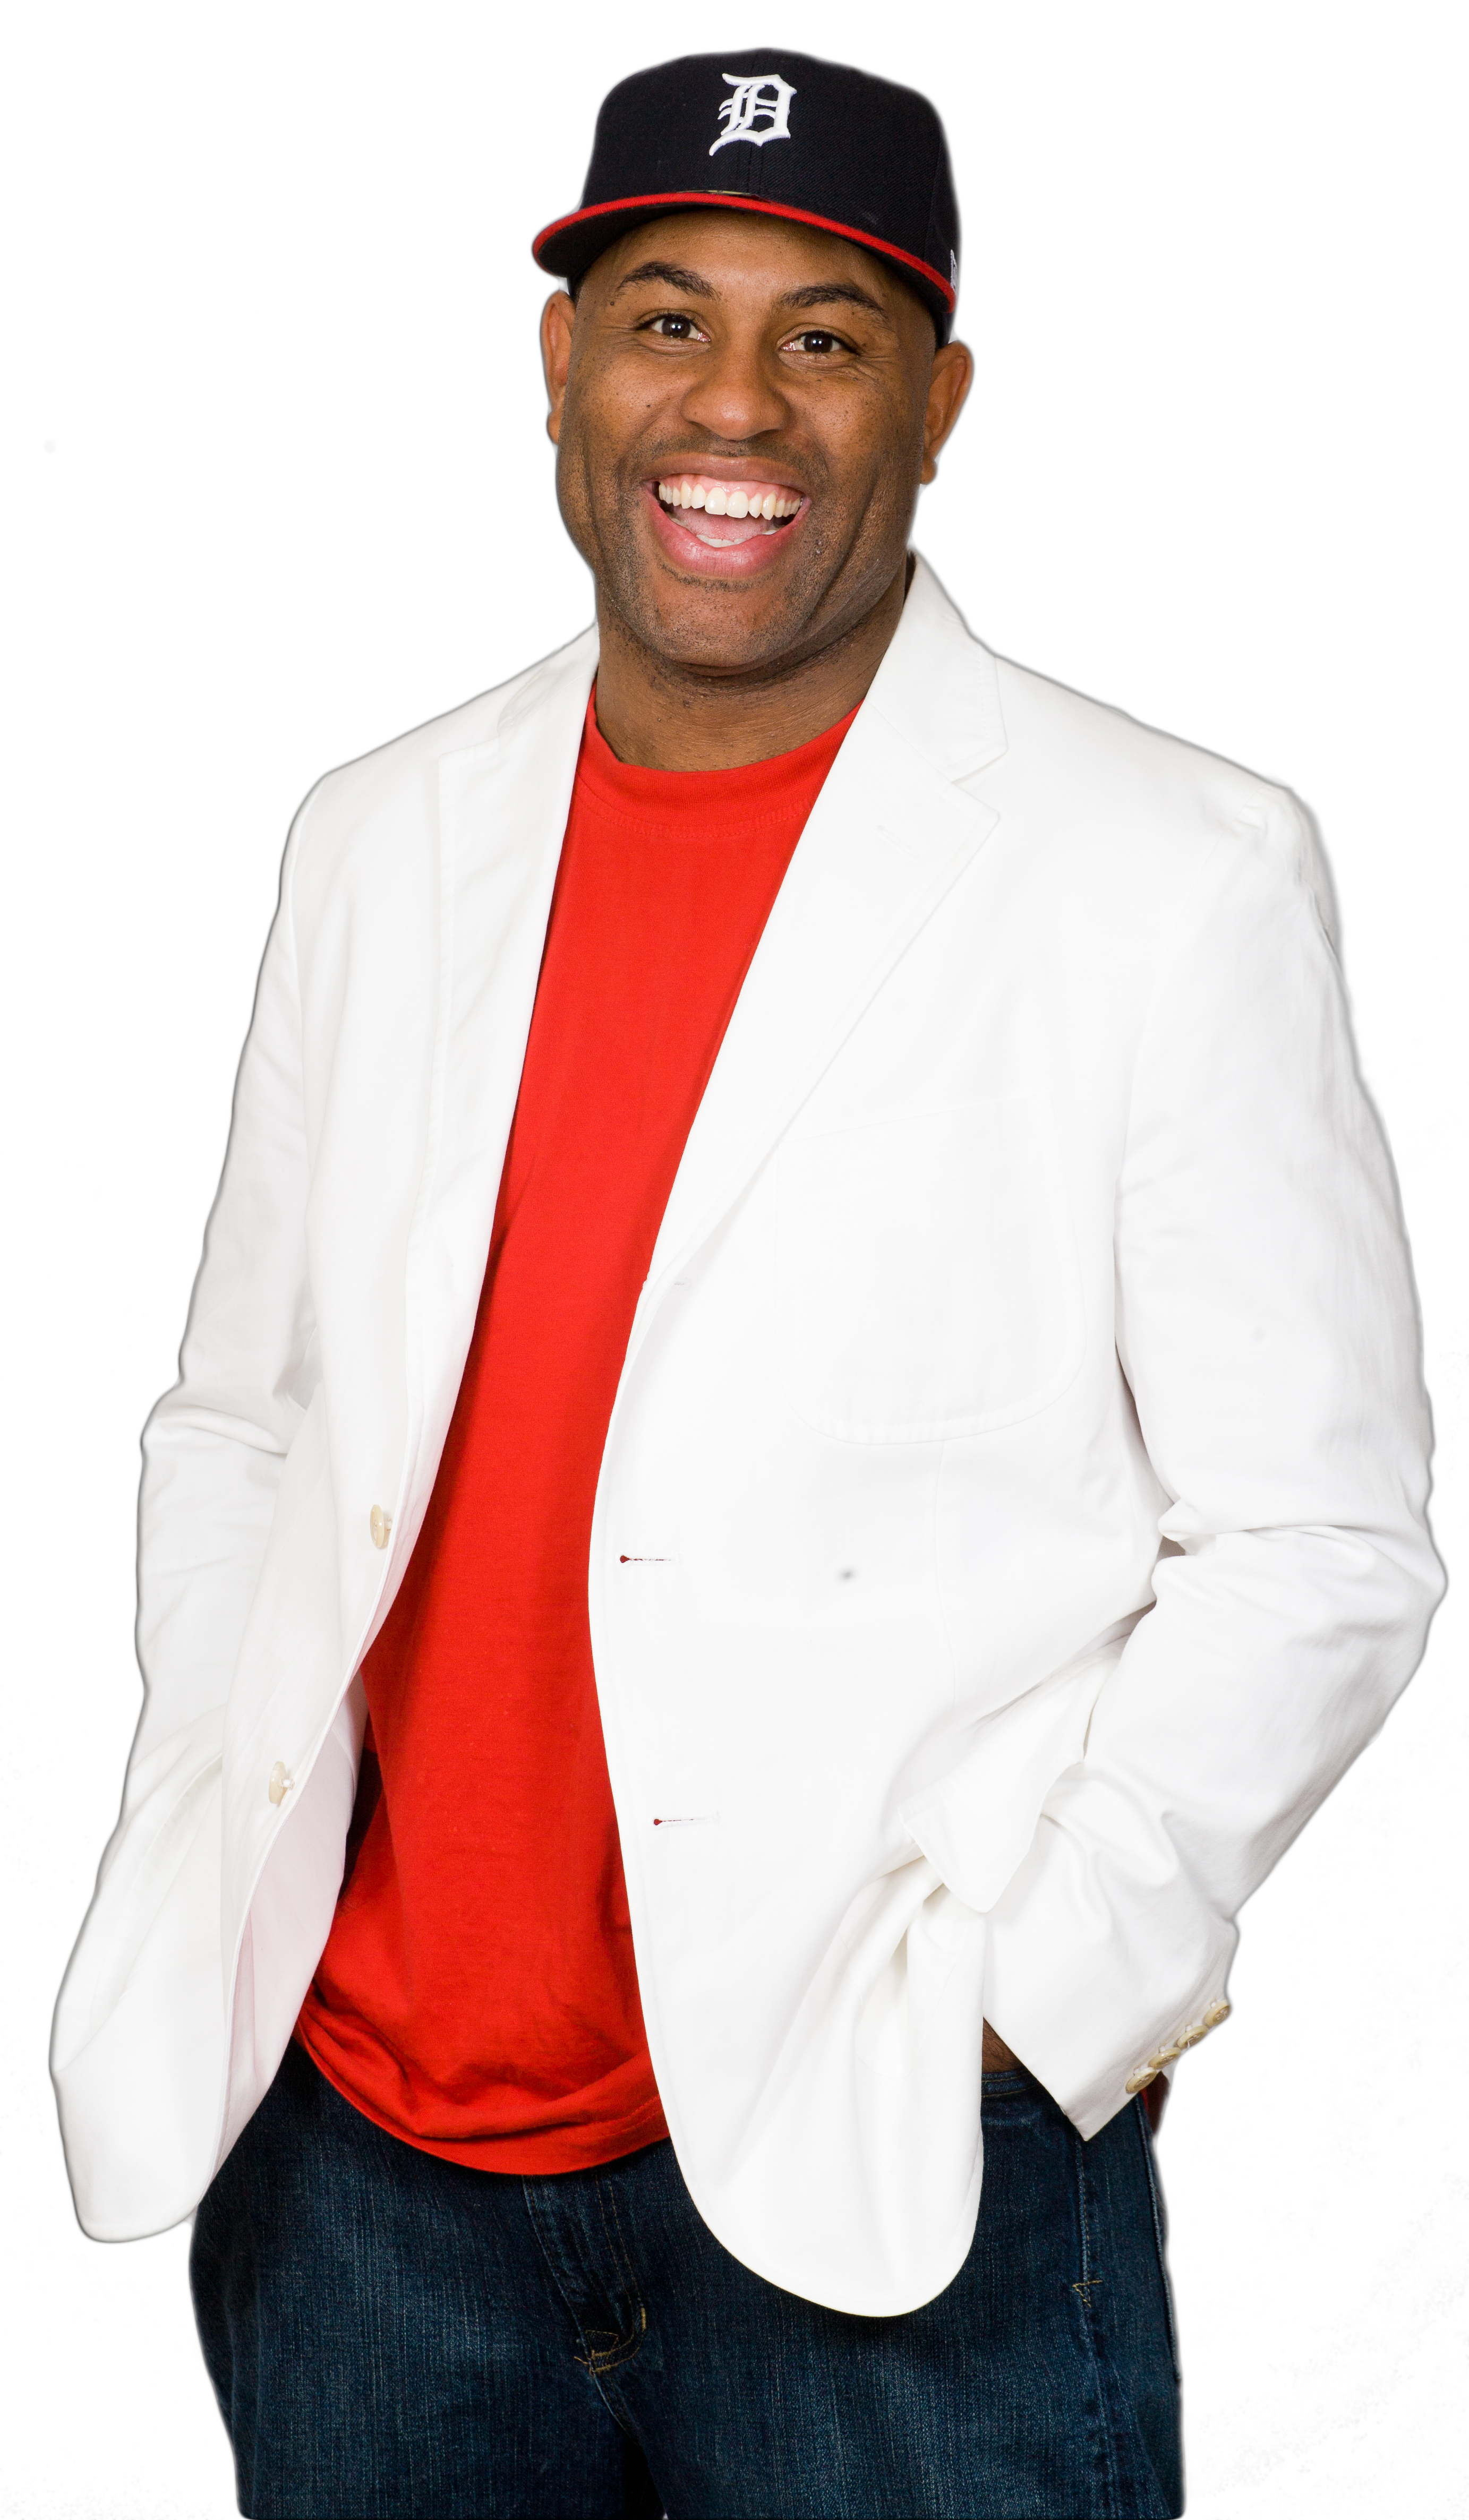 Eric Thomas (motivational speaker) - Wikipedia